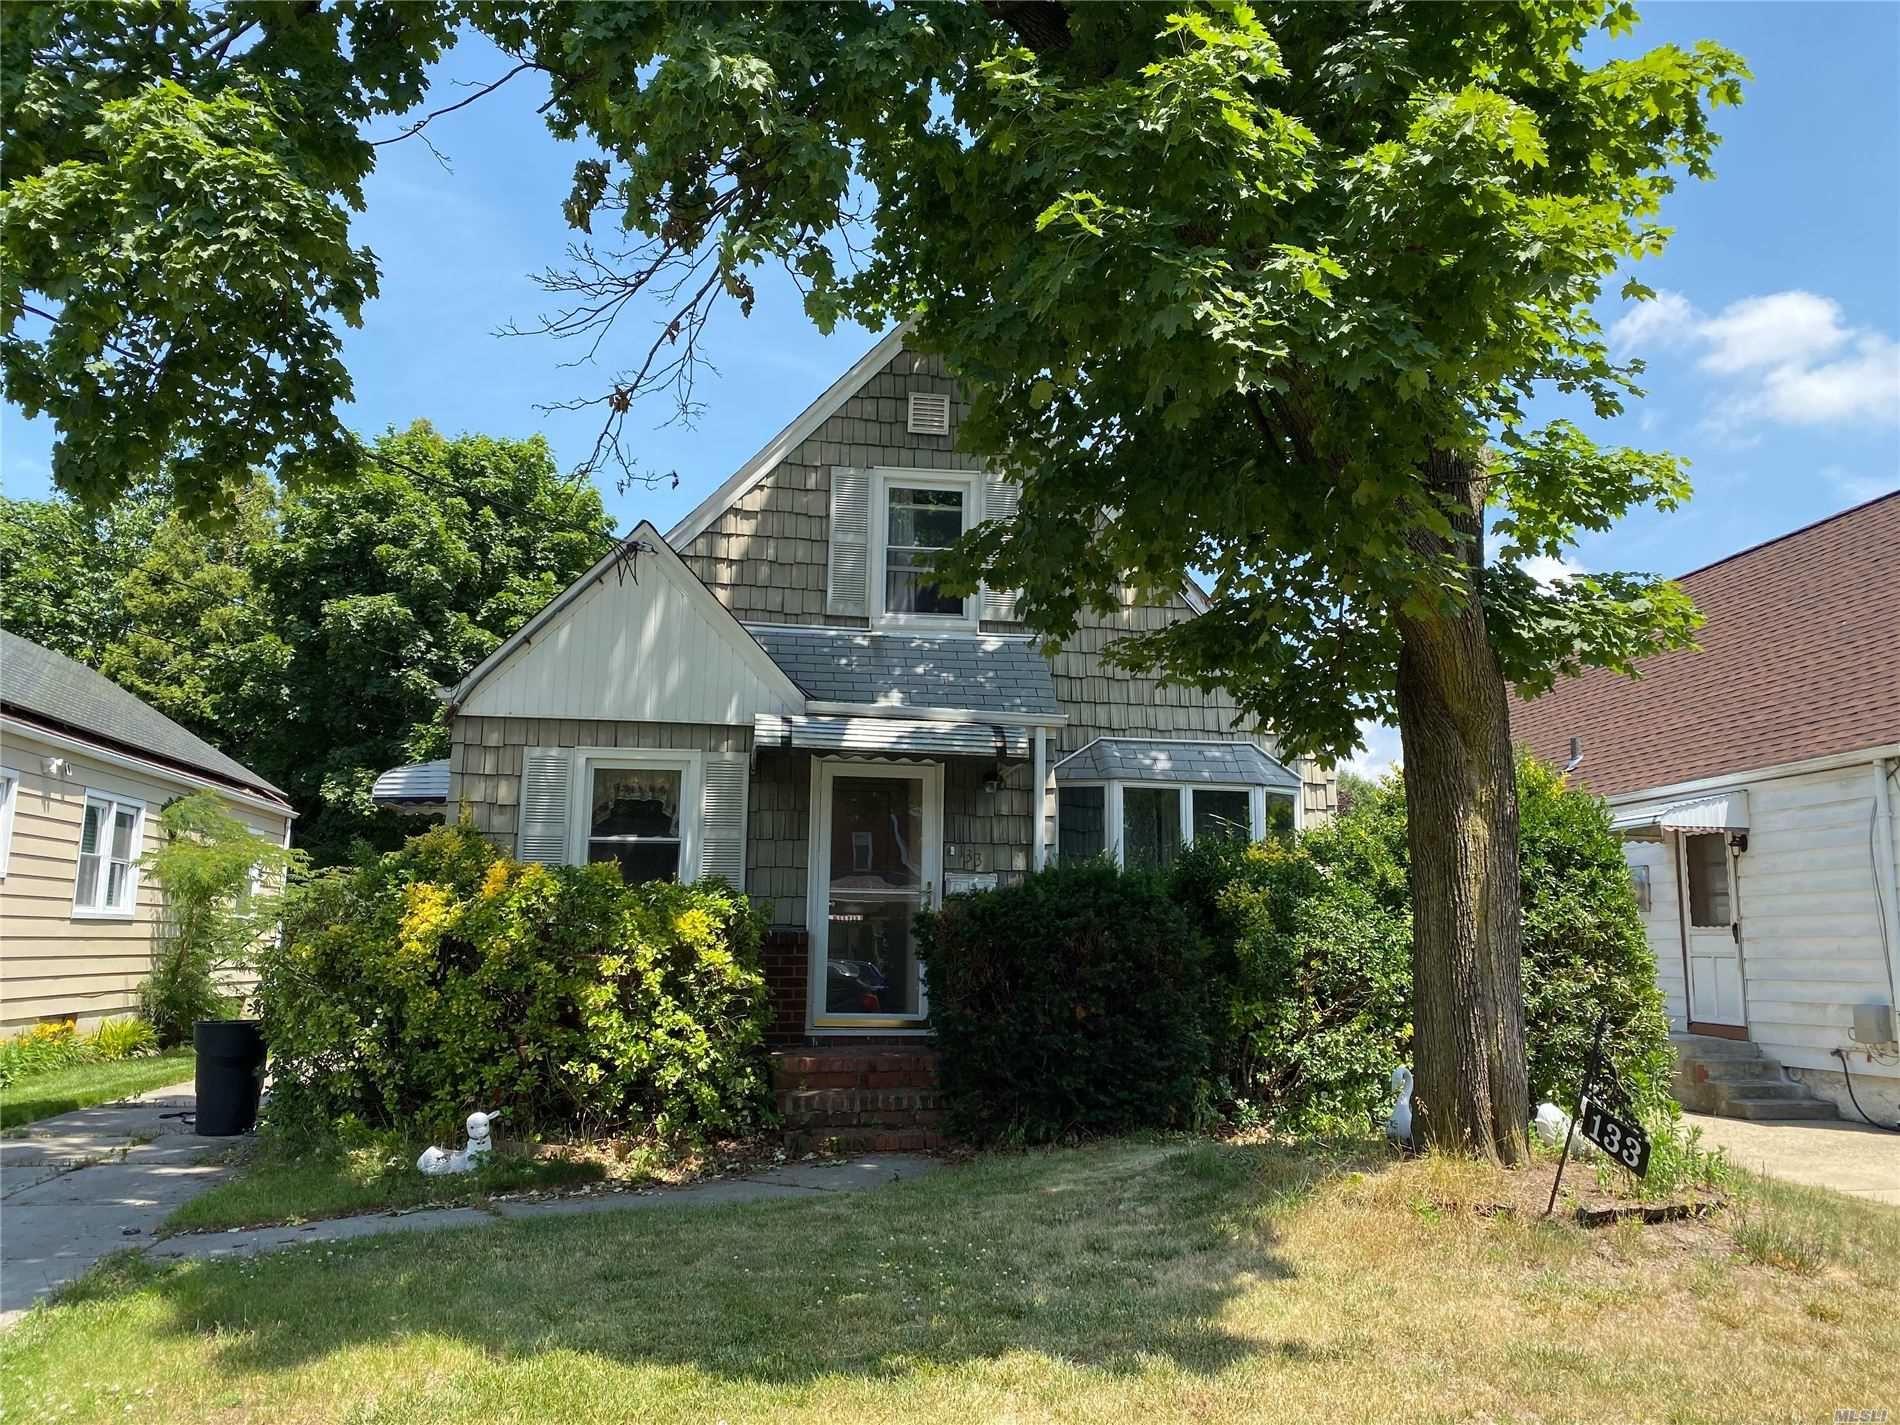 133 Weir Street, Hempstead, NY 11550 - MLS#: 3227320